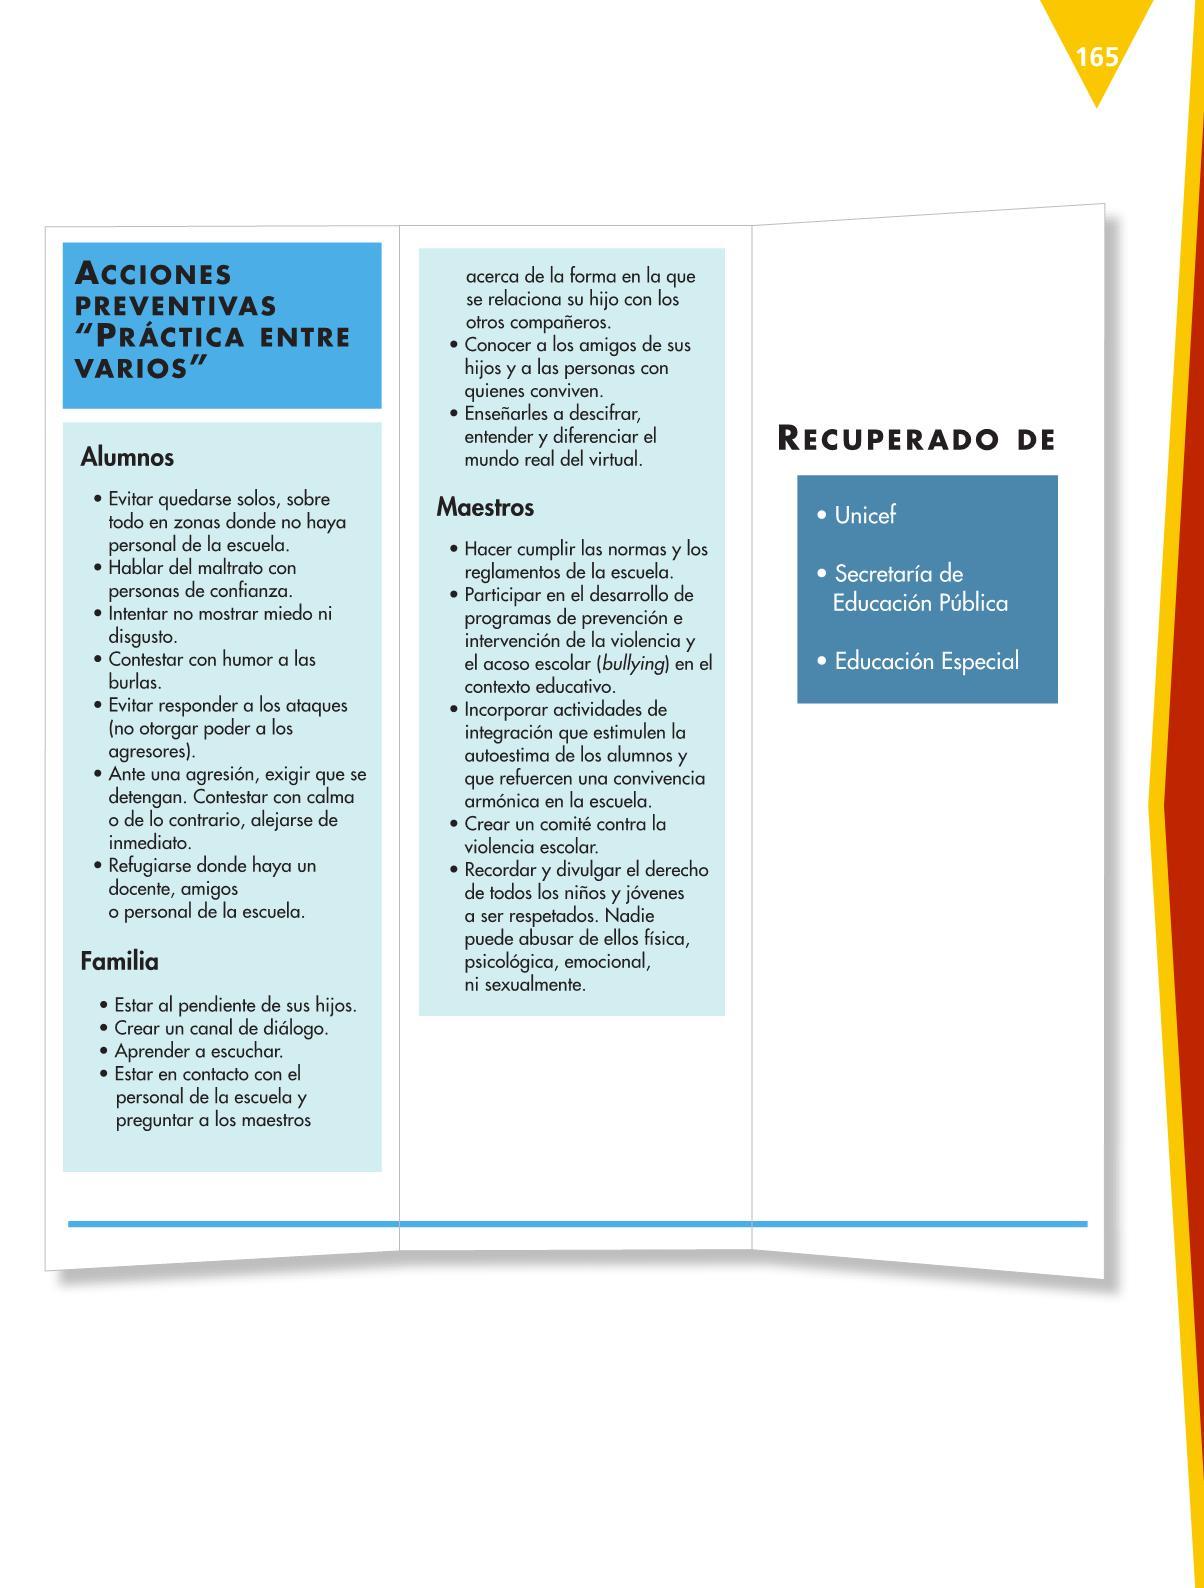 Español Libro para el alumnoquintoPagina 165